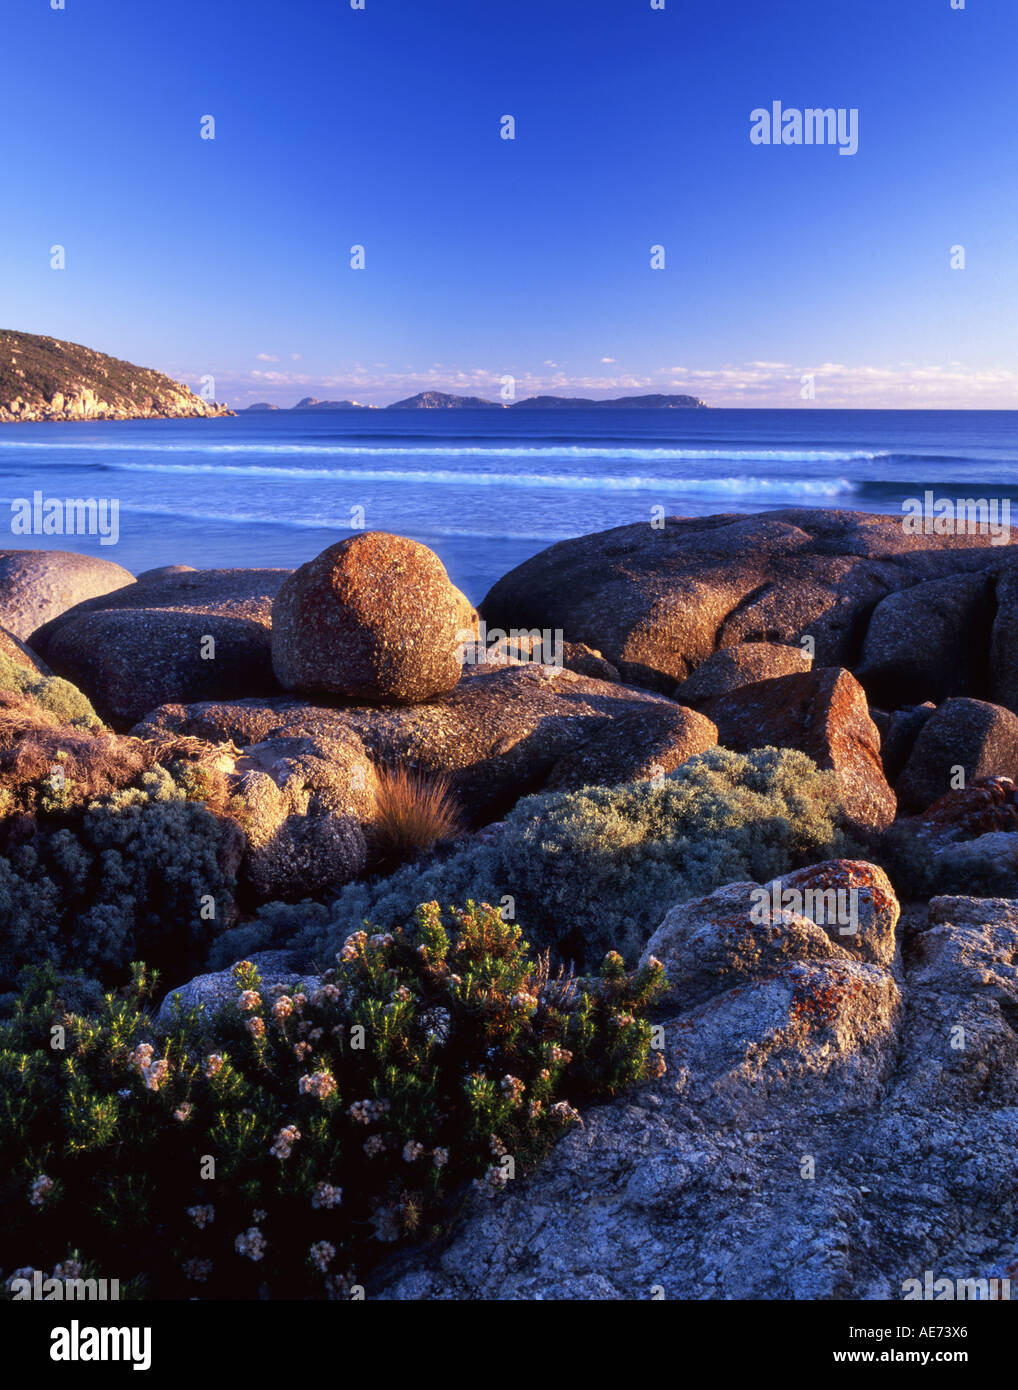 Massi di granito a Whisky Bay Wilsons Promontory National Park Victoria Australia Foto Stock